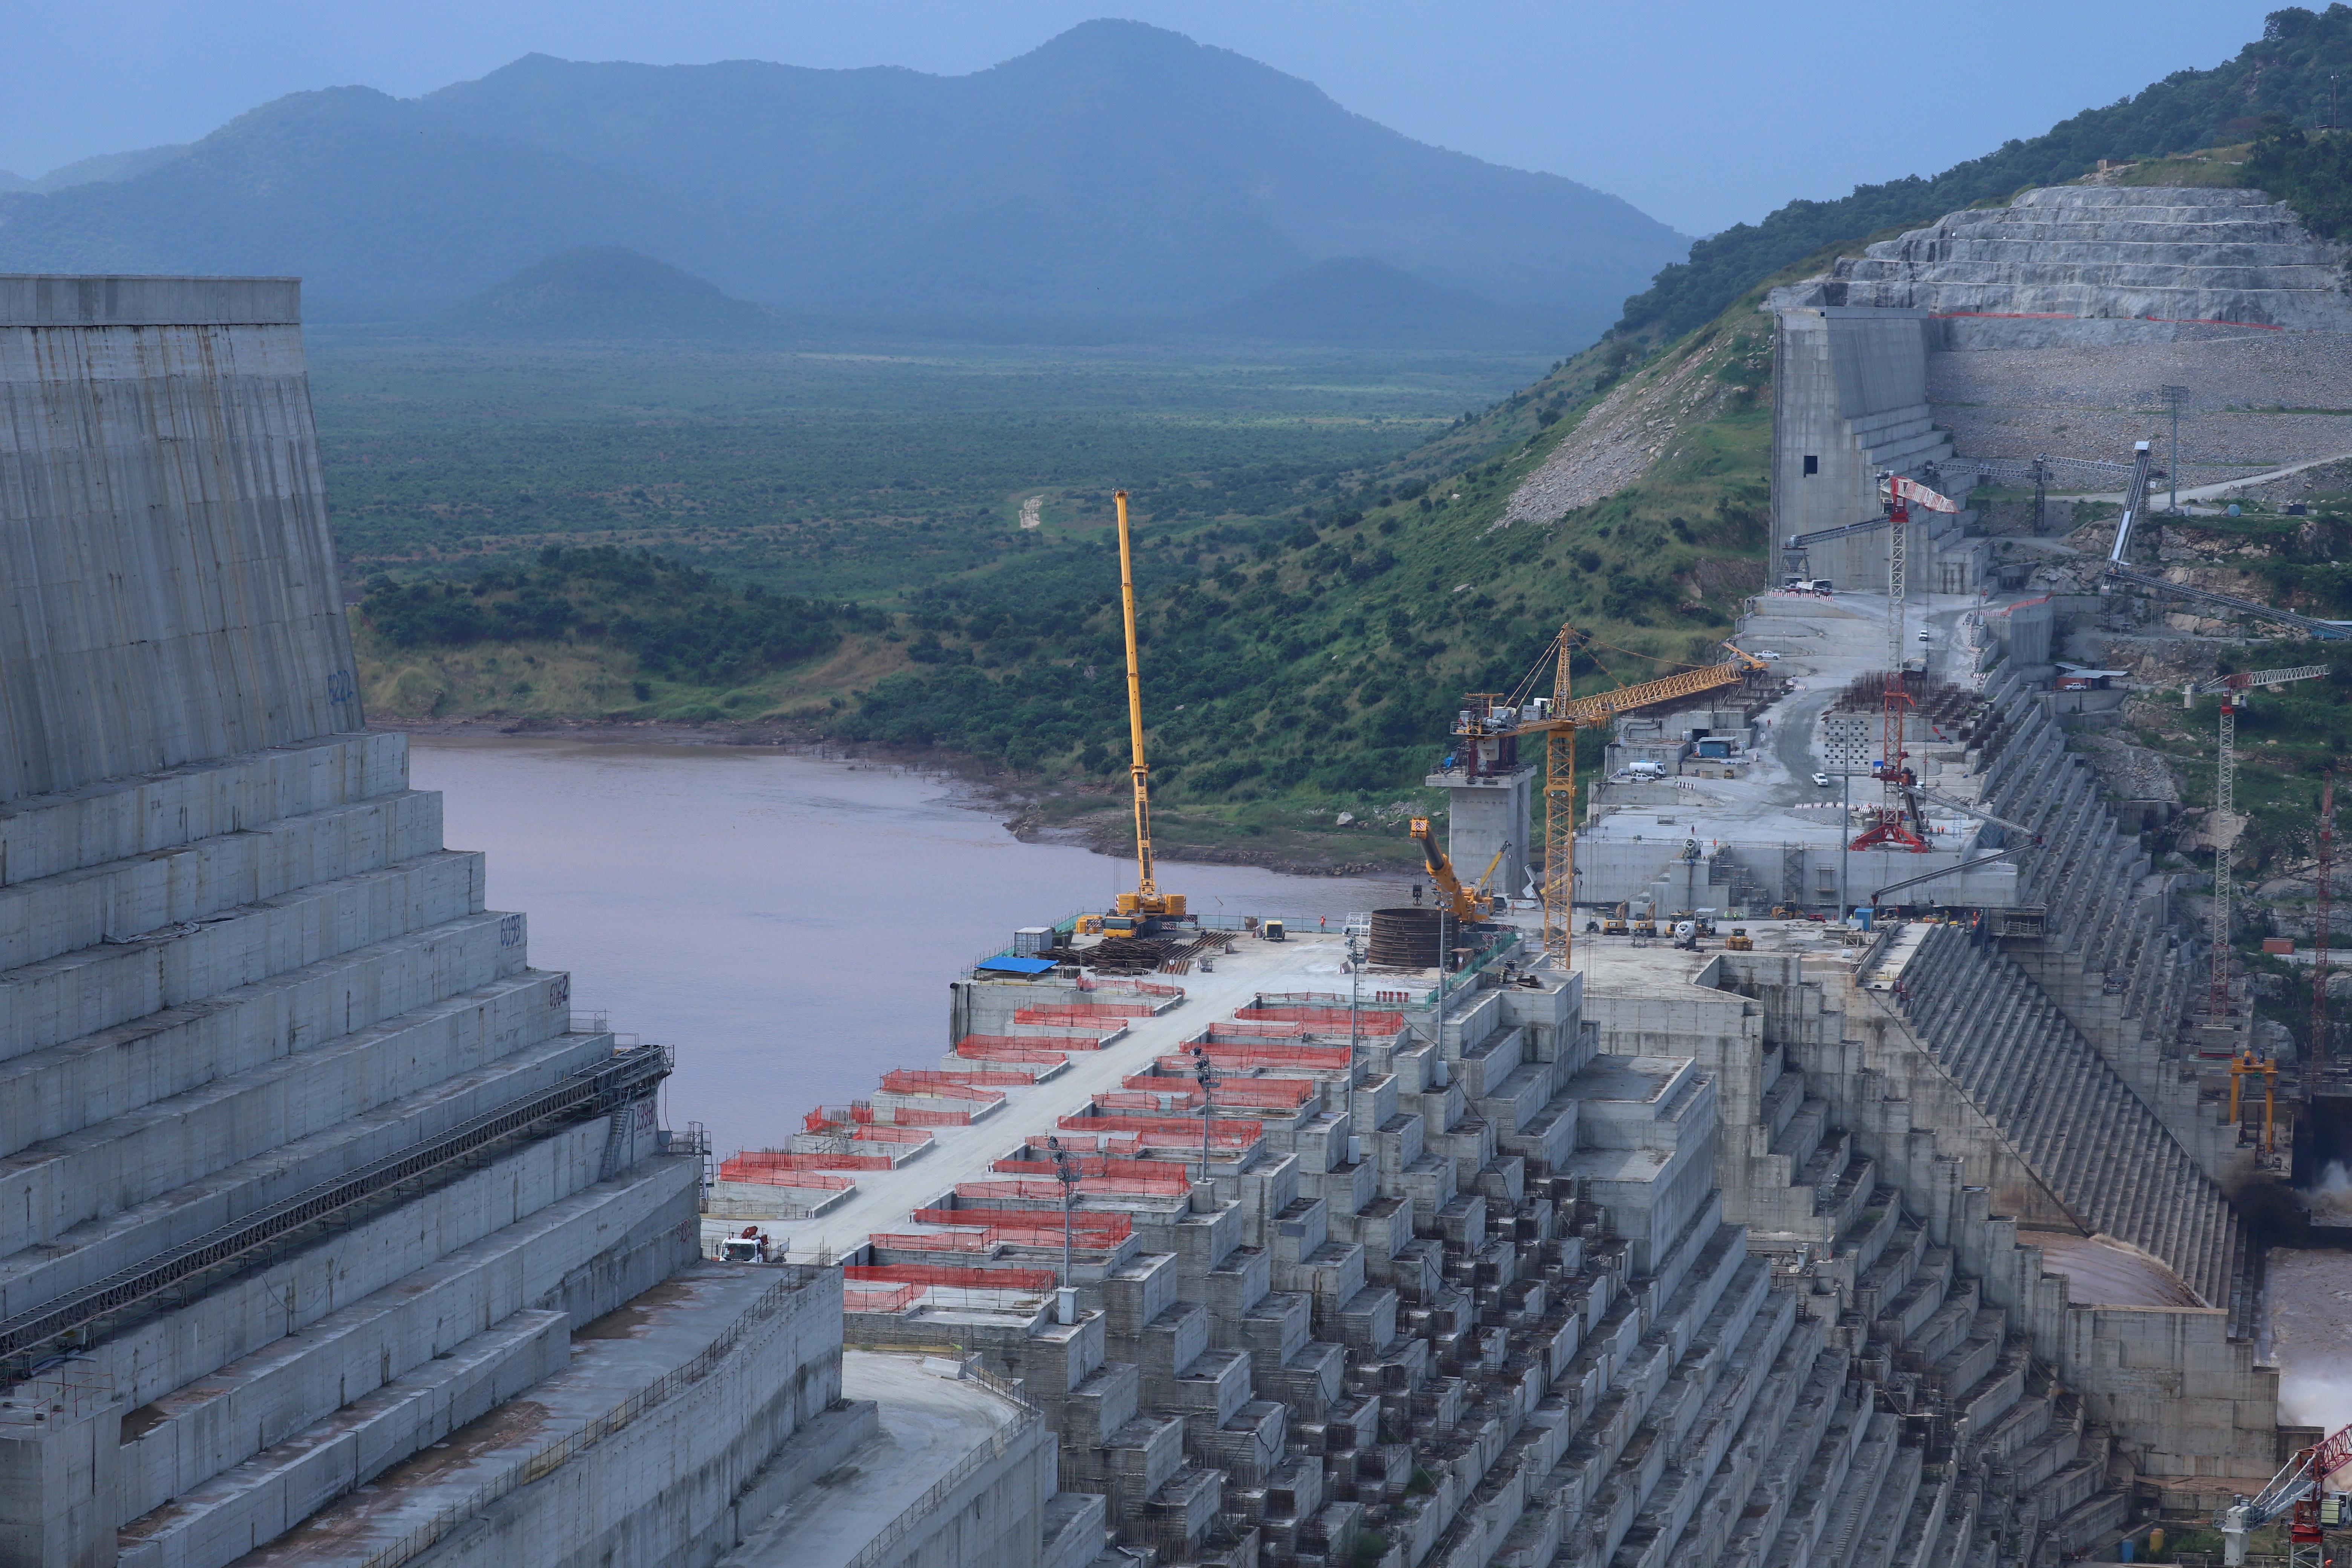 Ethiopia's Grand Renaissance Dam is seen as it undergoes construction work on the river Nile in Guba Woreda, Benishangul Gumuz Region, Ethiopia, September 26, 2019. REUTERS/Tiksa Negeri/File Photo